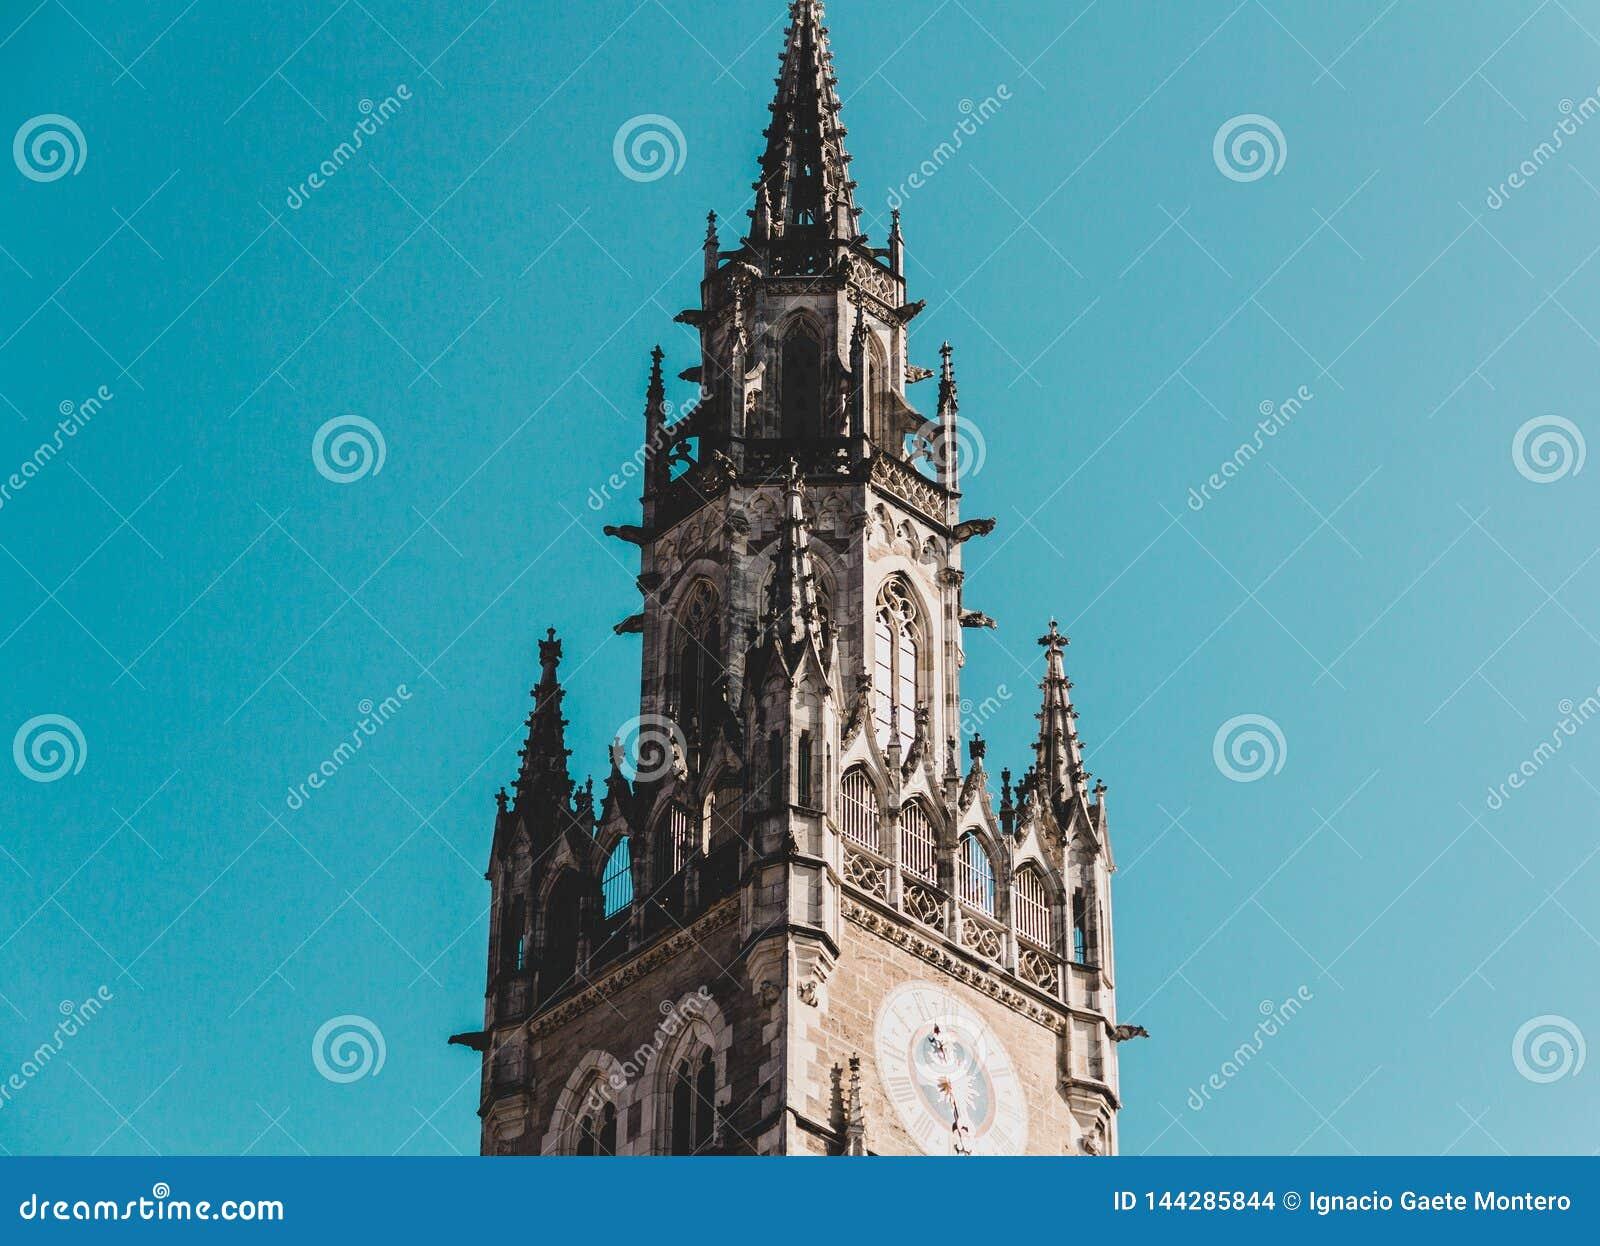 Nowa urząd miasta niemiec: Neues Rathaus; Centrala Bawarska: Neis Rathaus